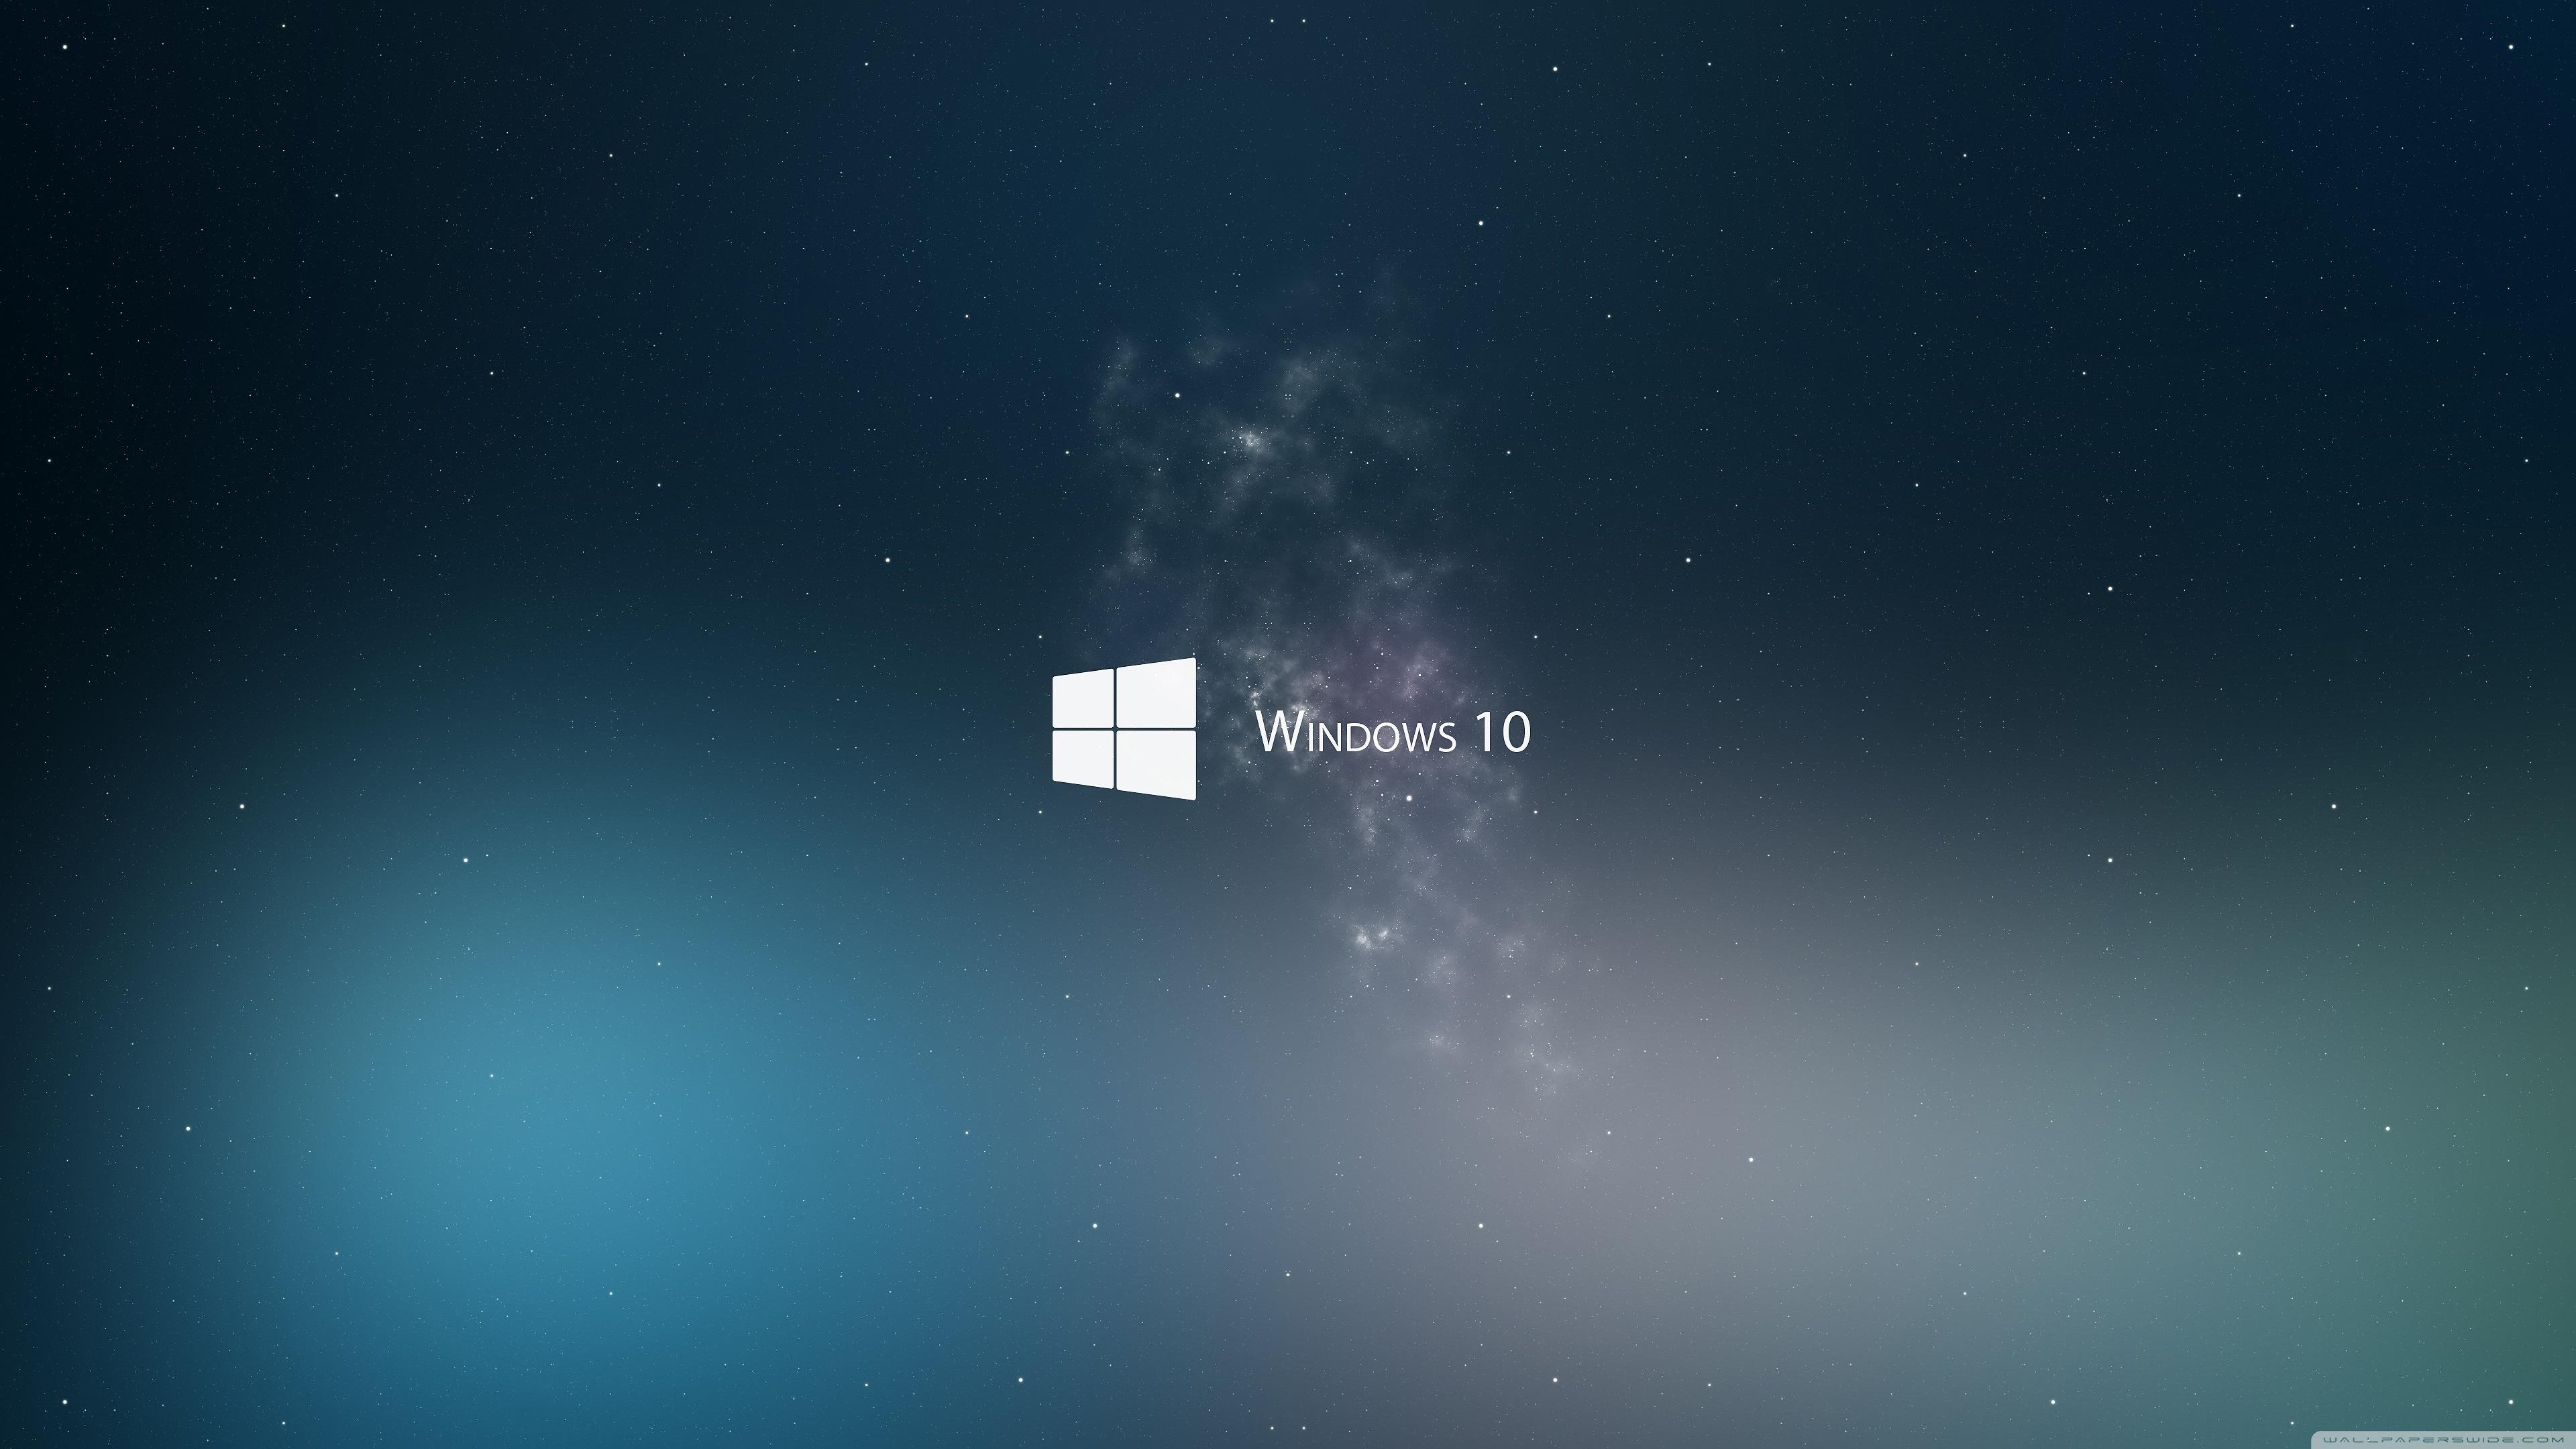 WallpapersWide com | Windows HD Desktop Wallpapers for Widescreen